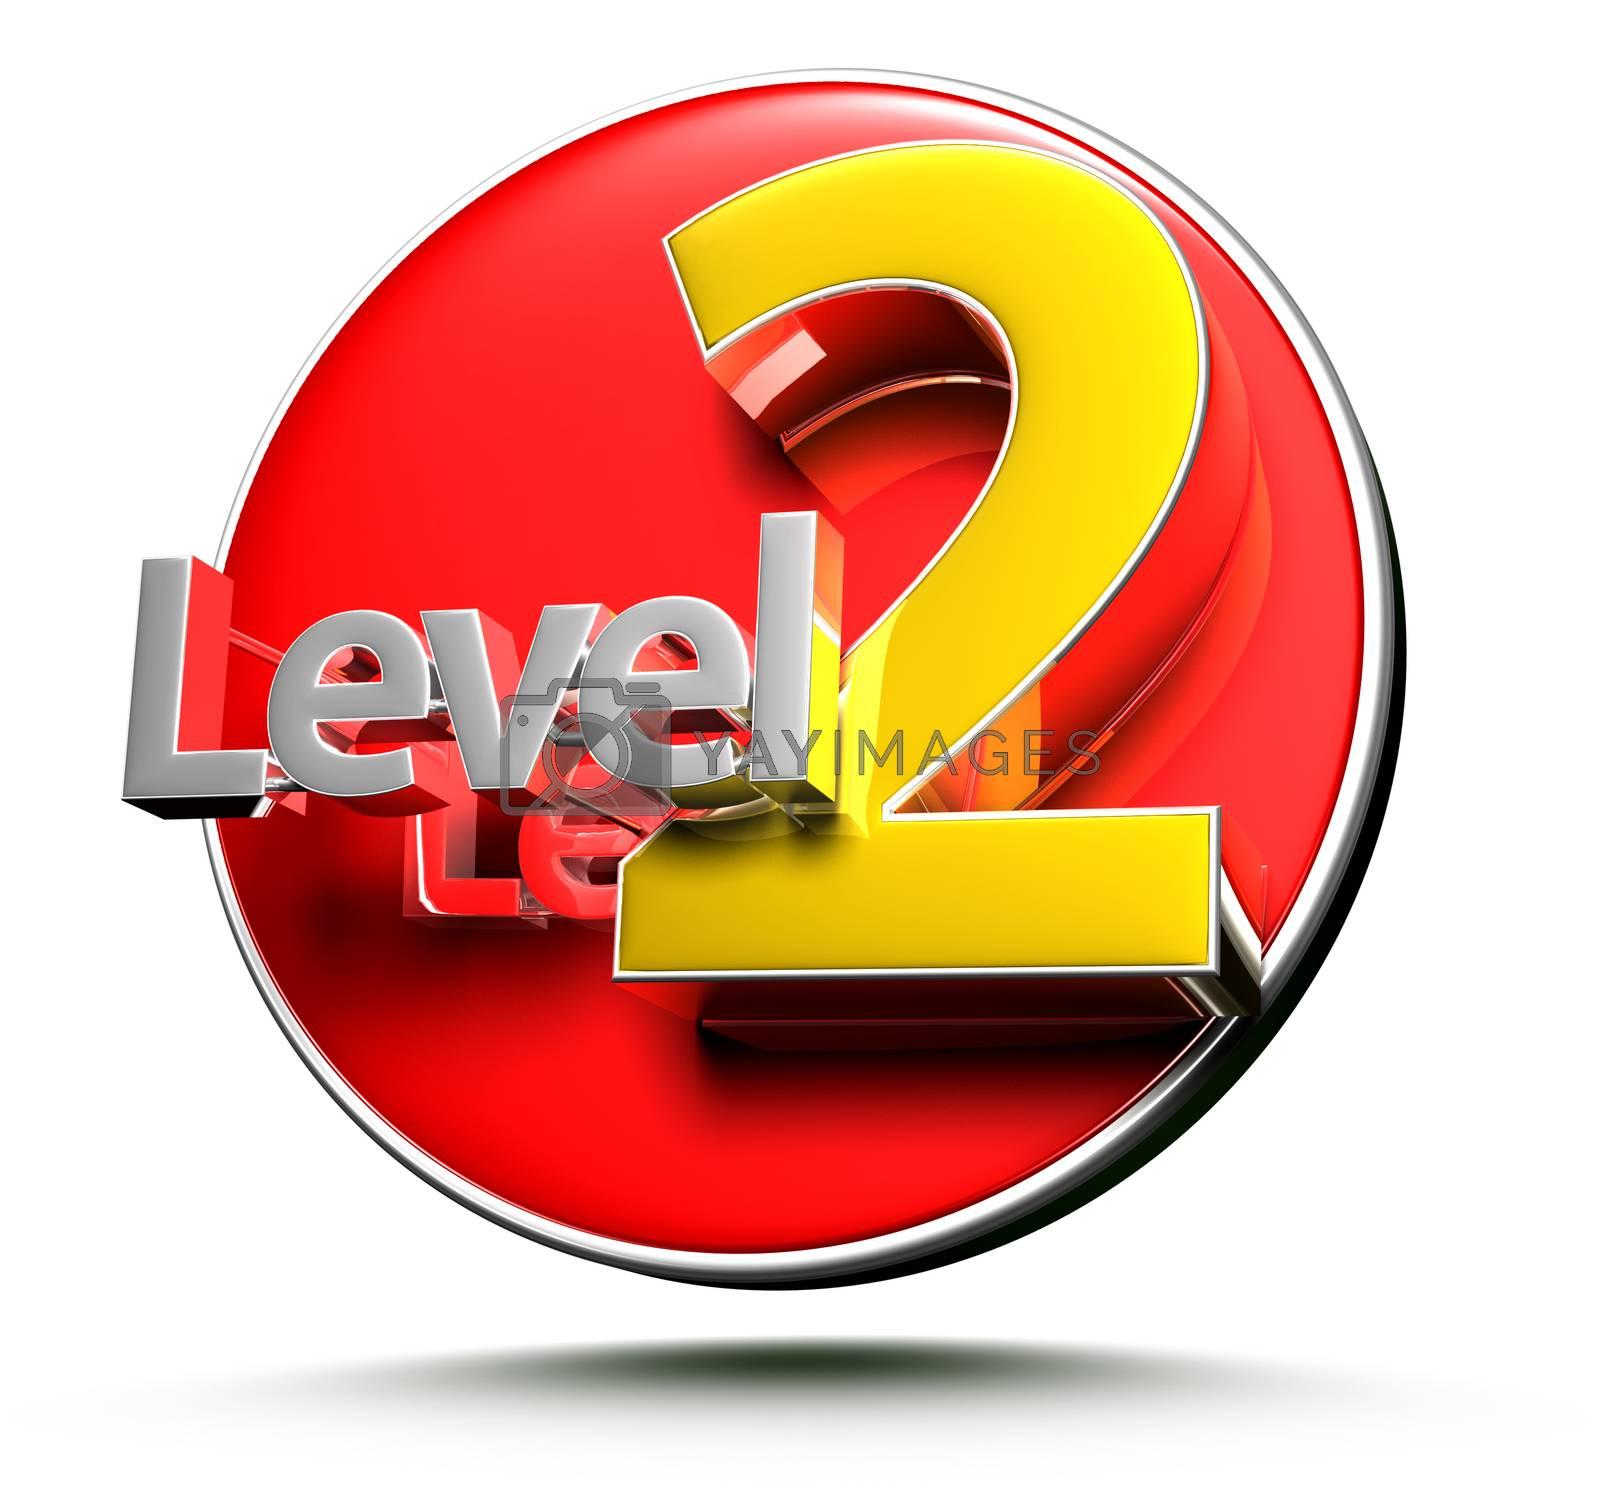 Level 2 3d. by thitimontoyai